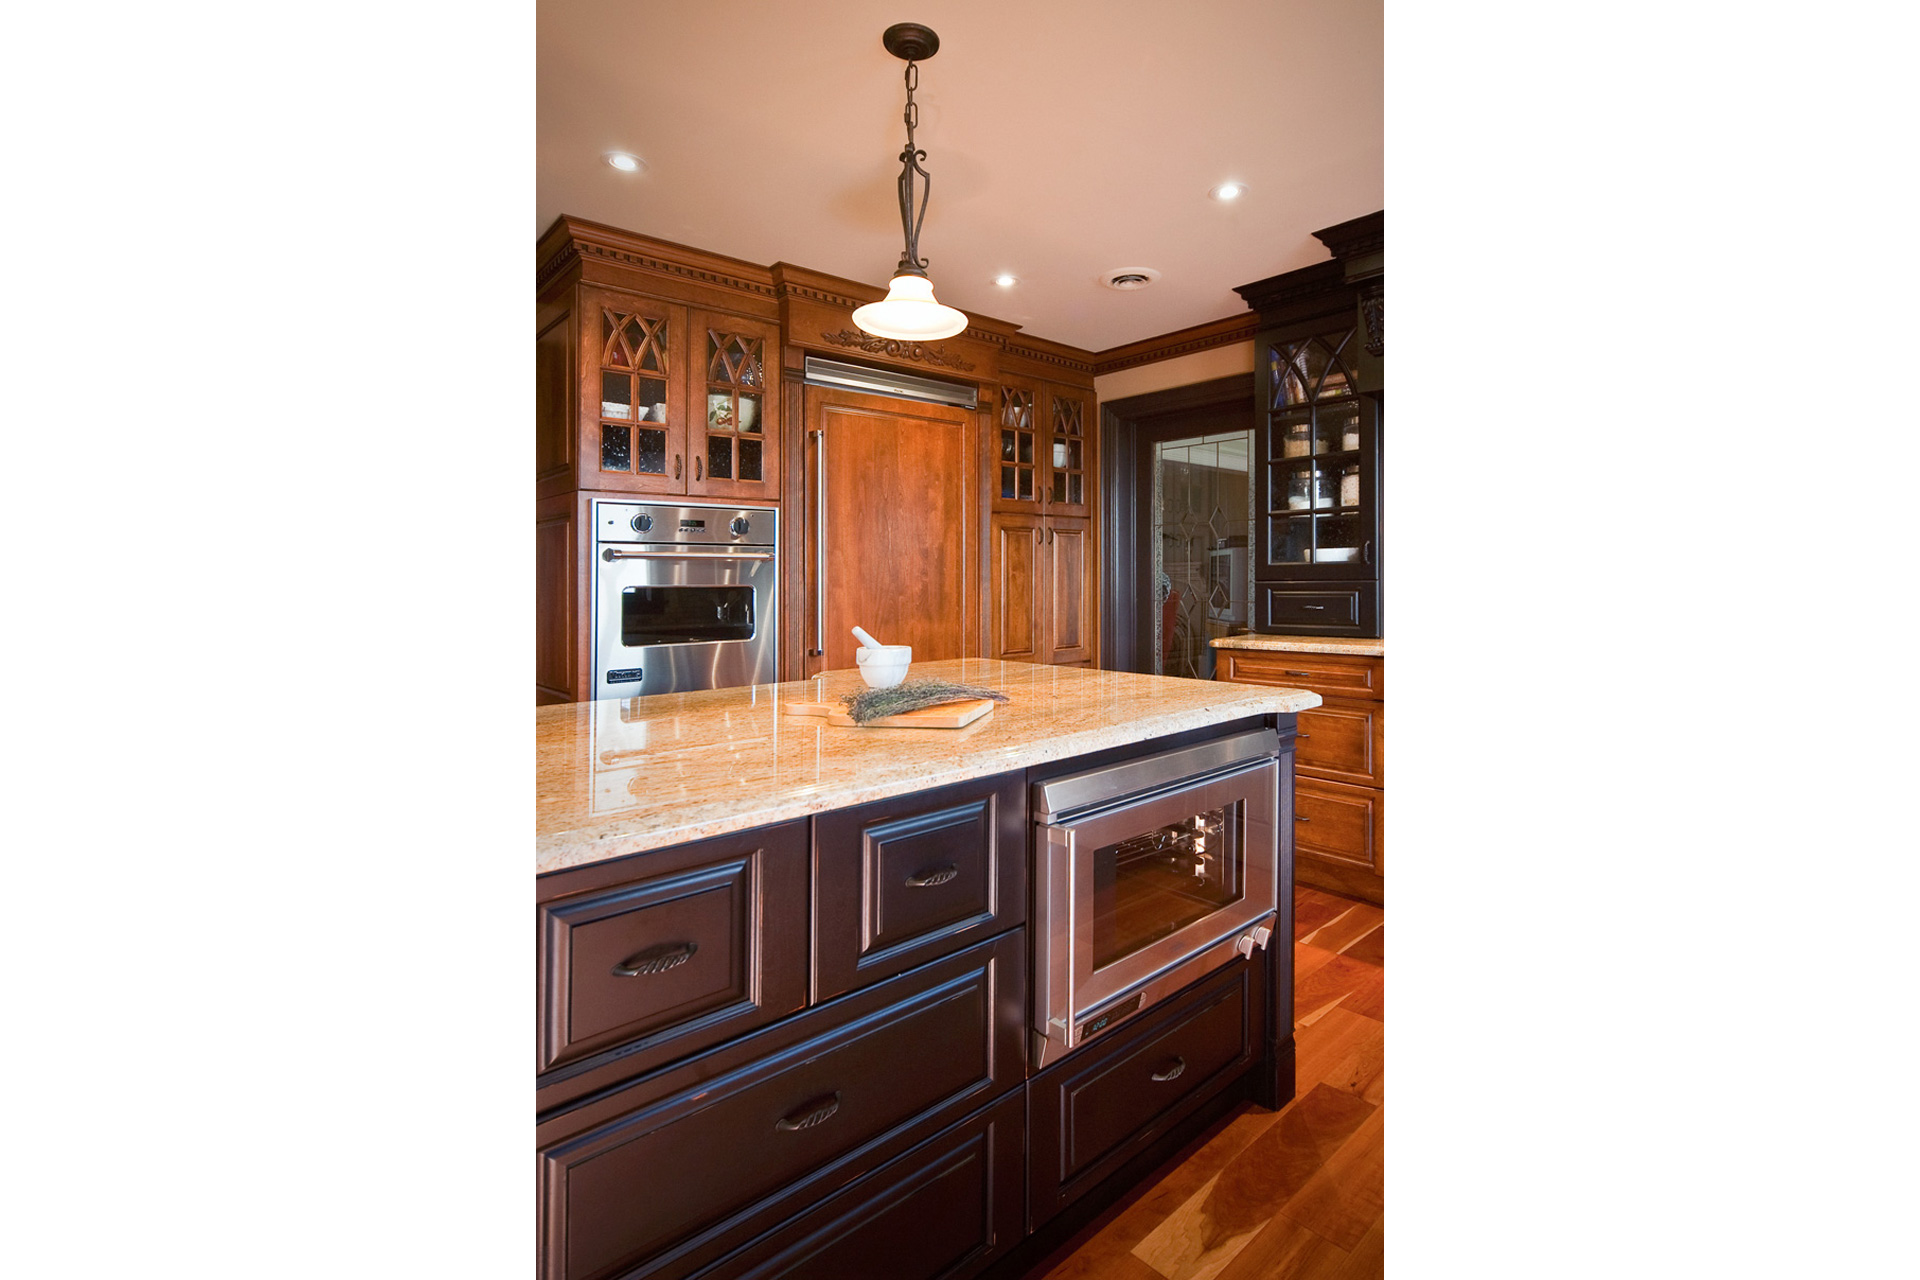 Kitchen with large black wood island - Sheridan Interiors